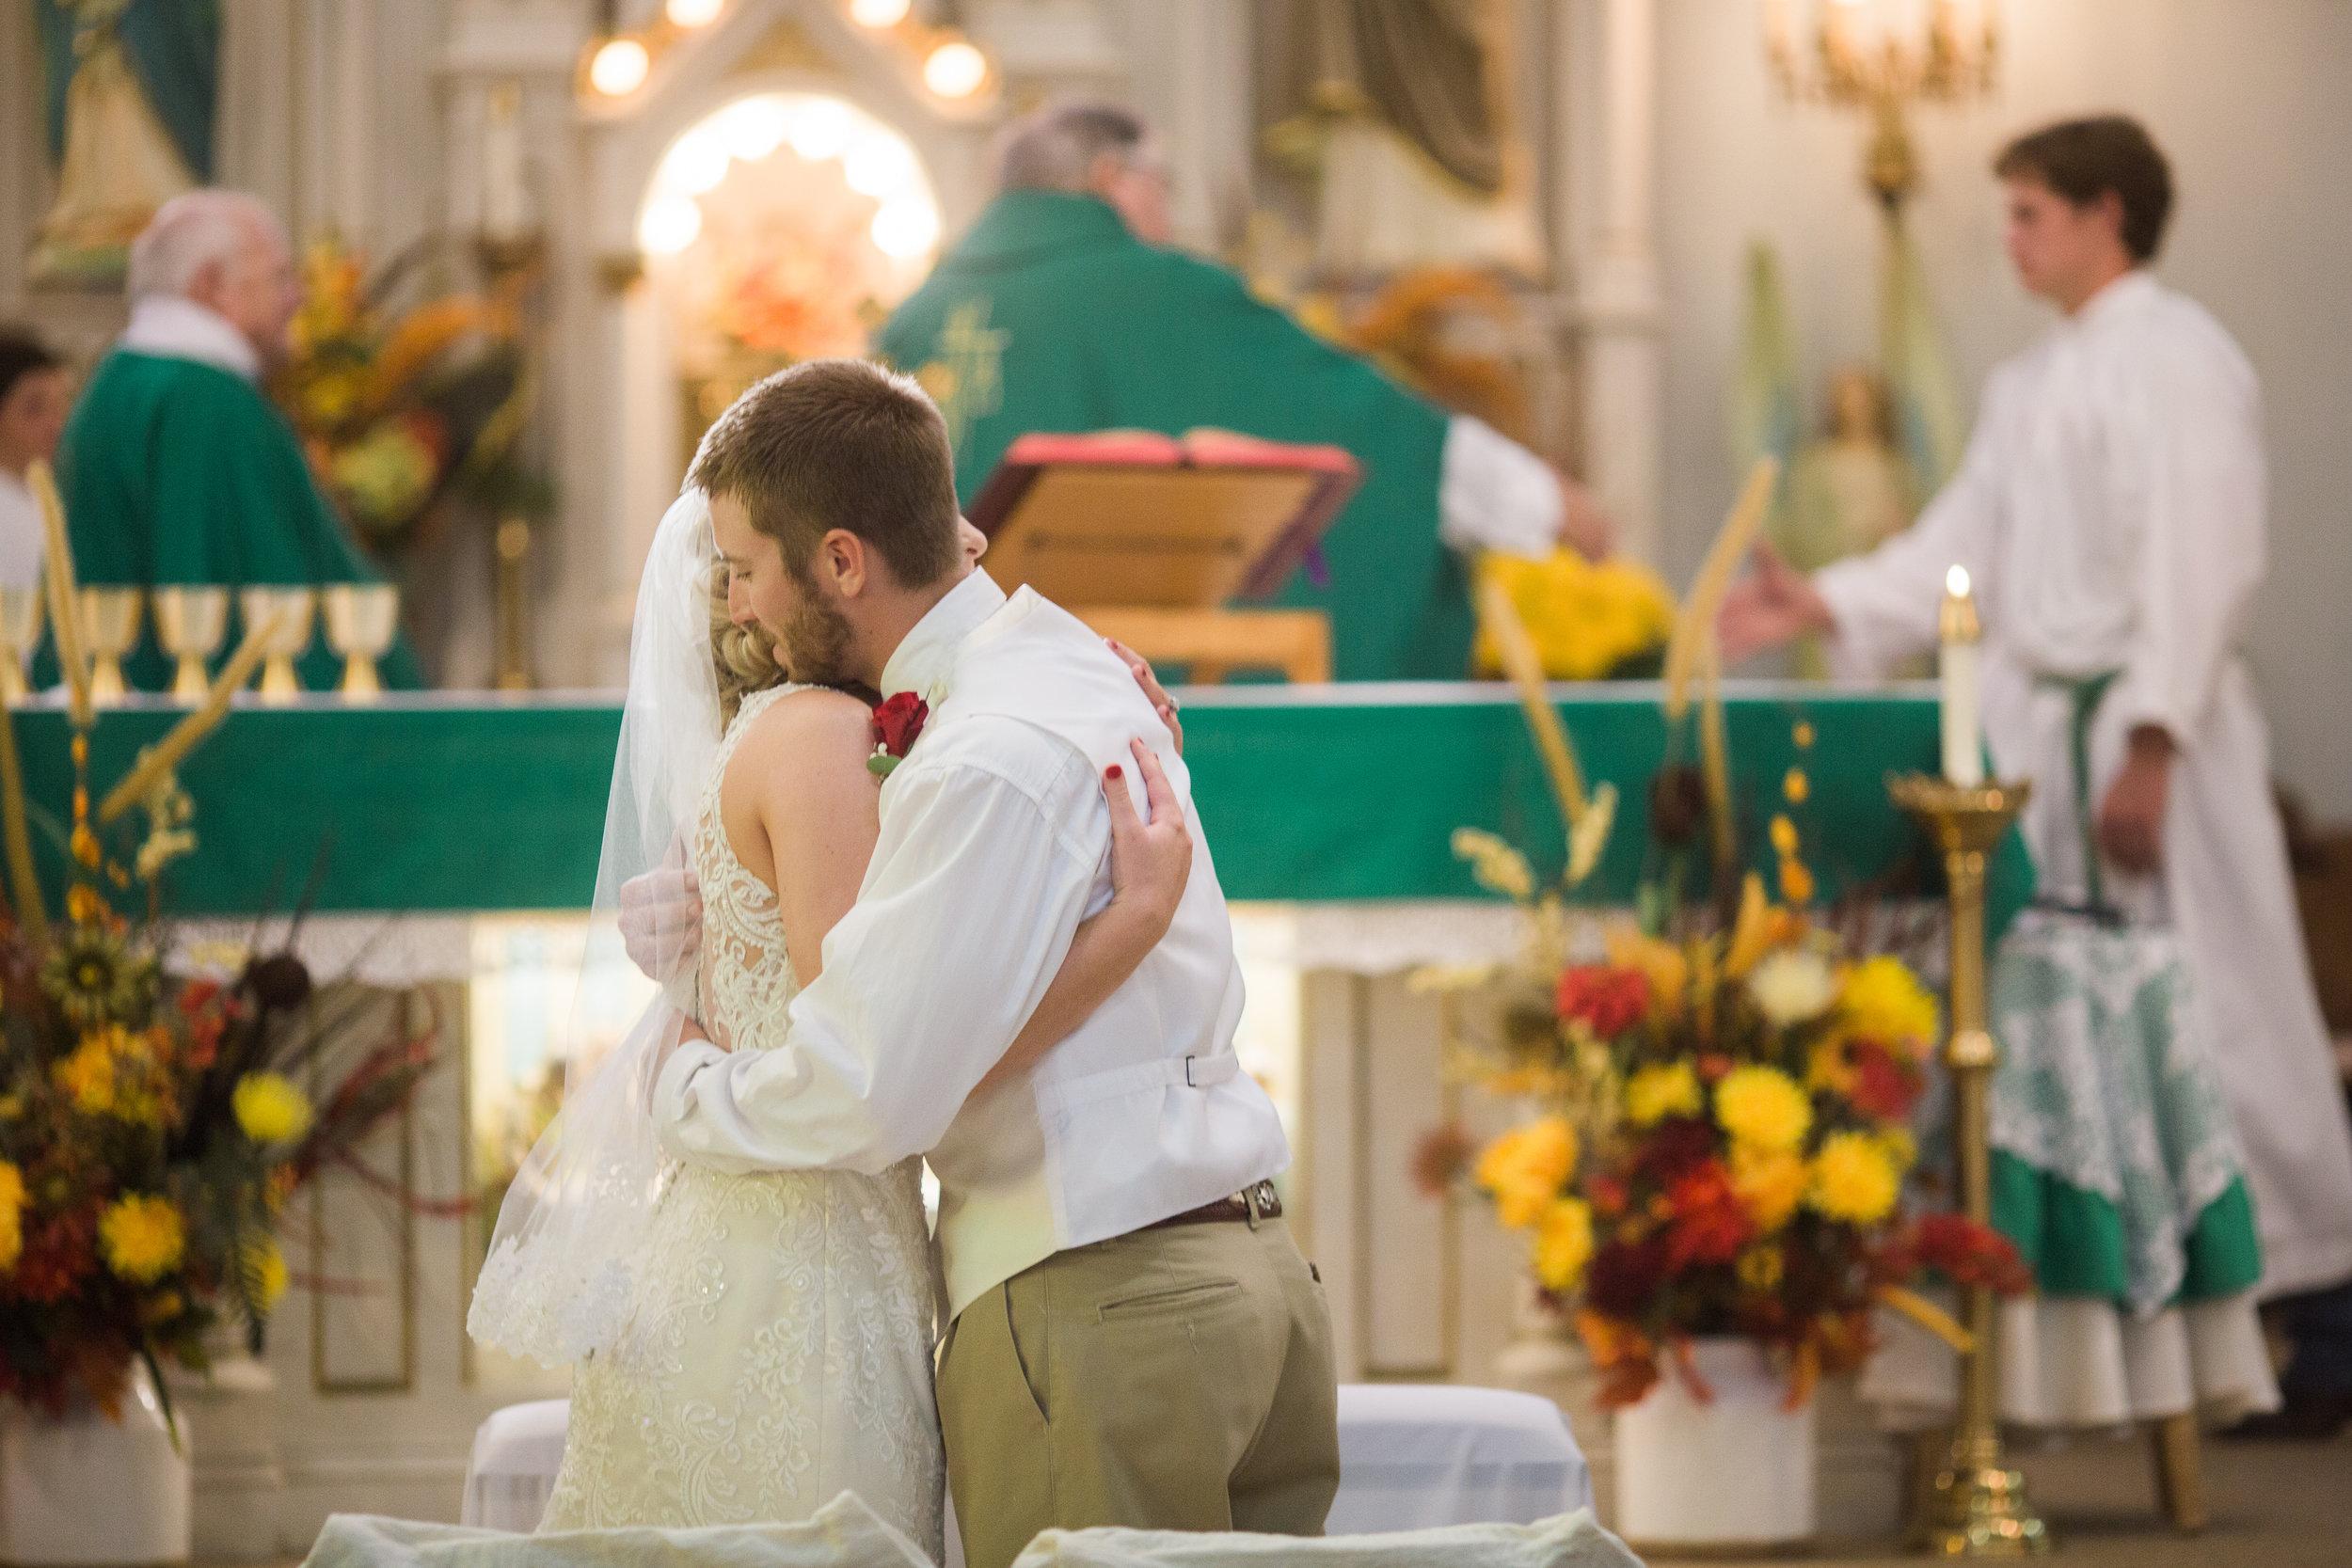 Bailey-Nathan-Windthorst-Texas-Wedding-040.jpg